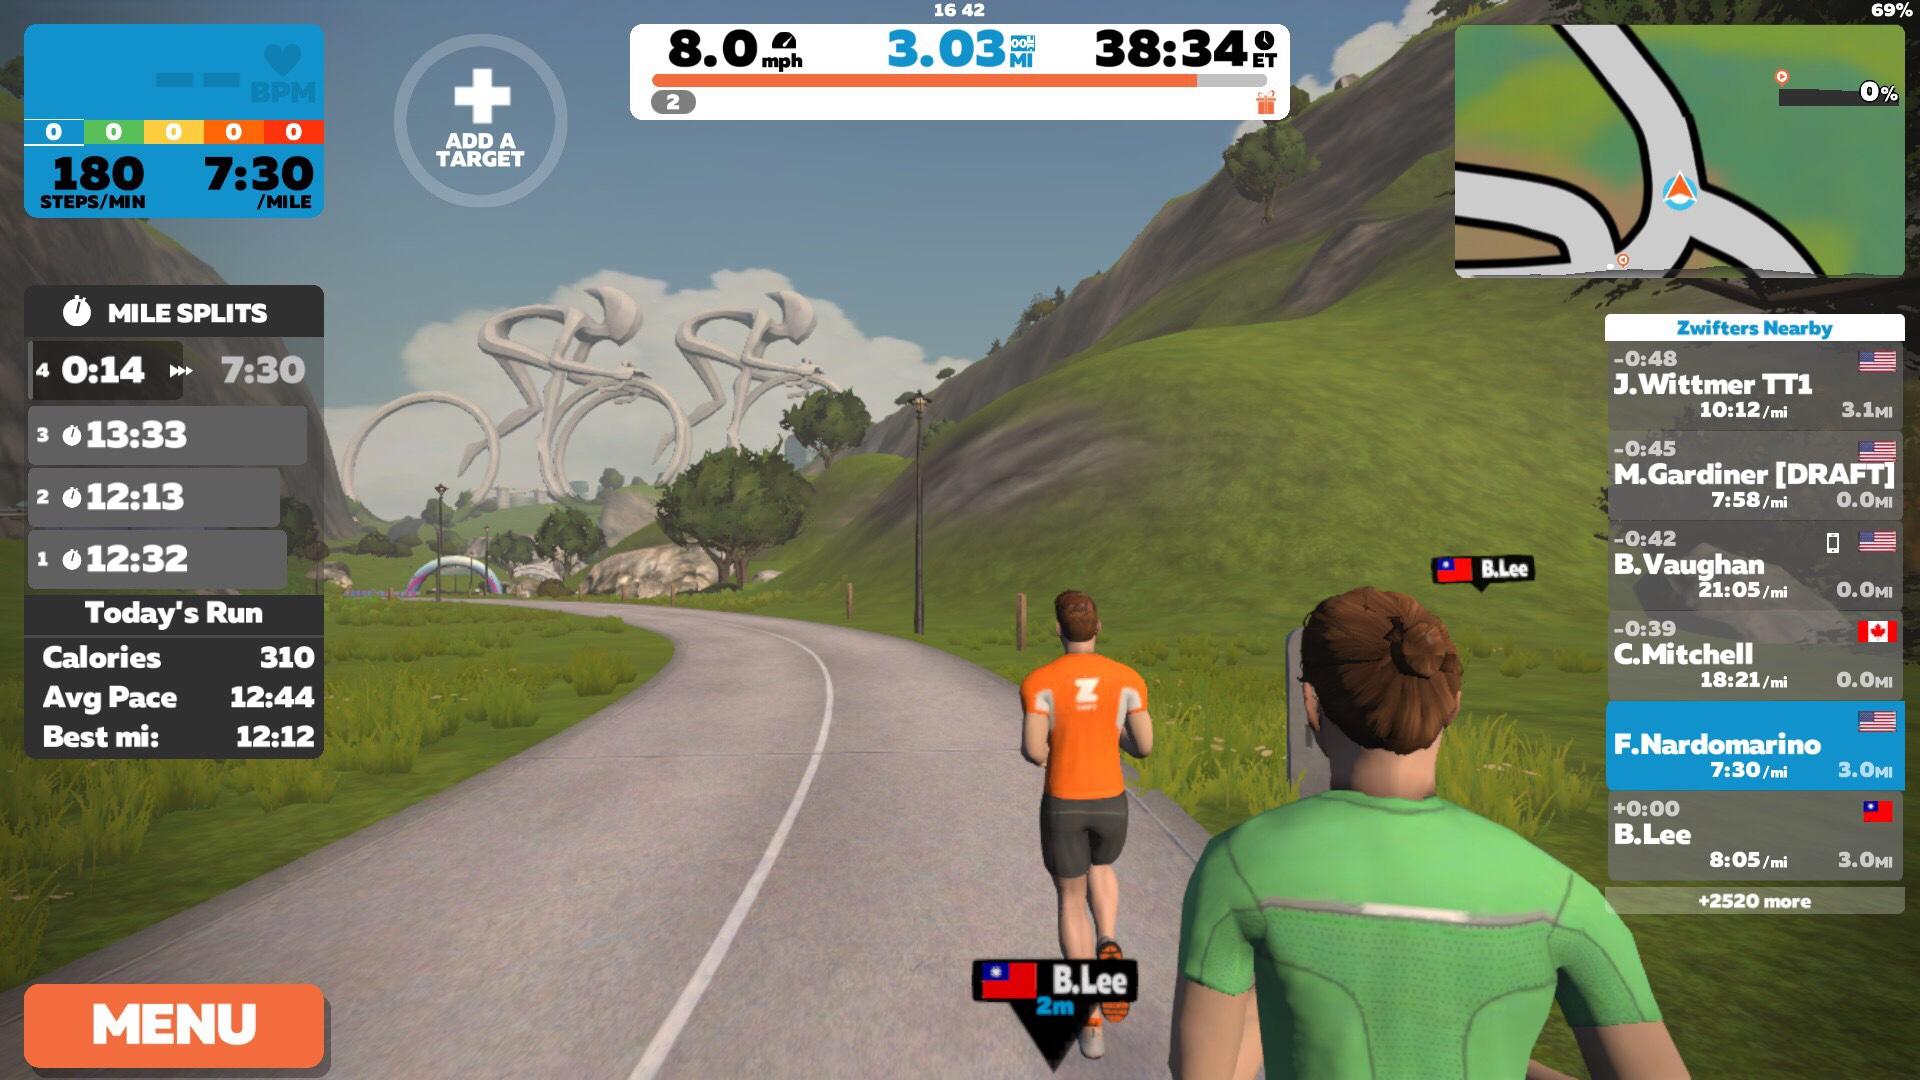 Zwift Running App – franklyrunning